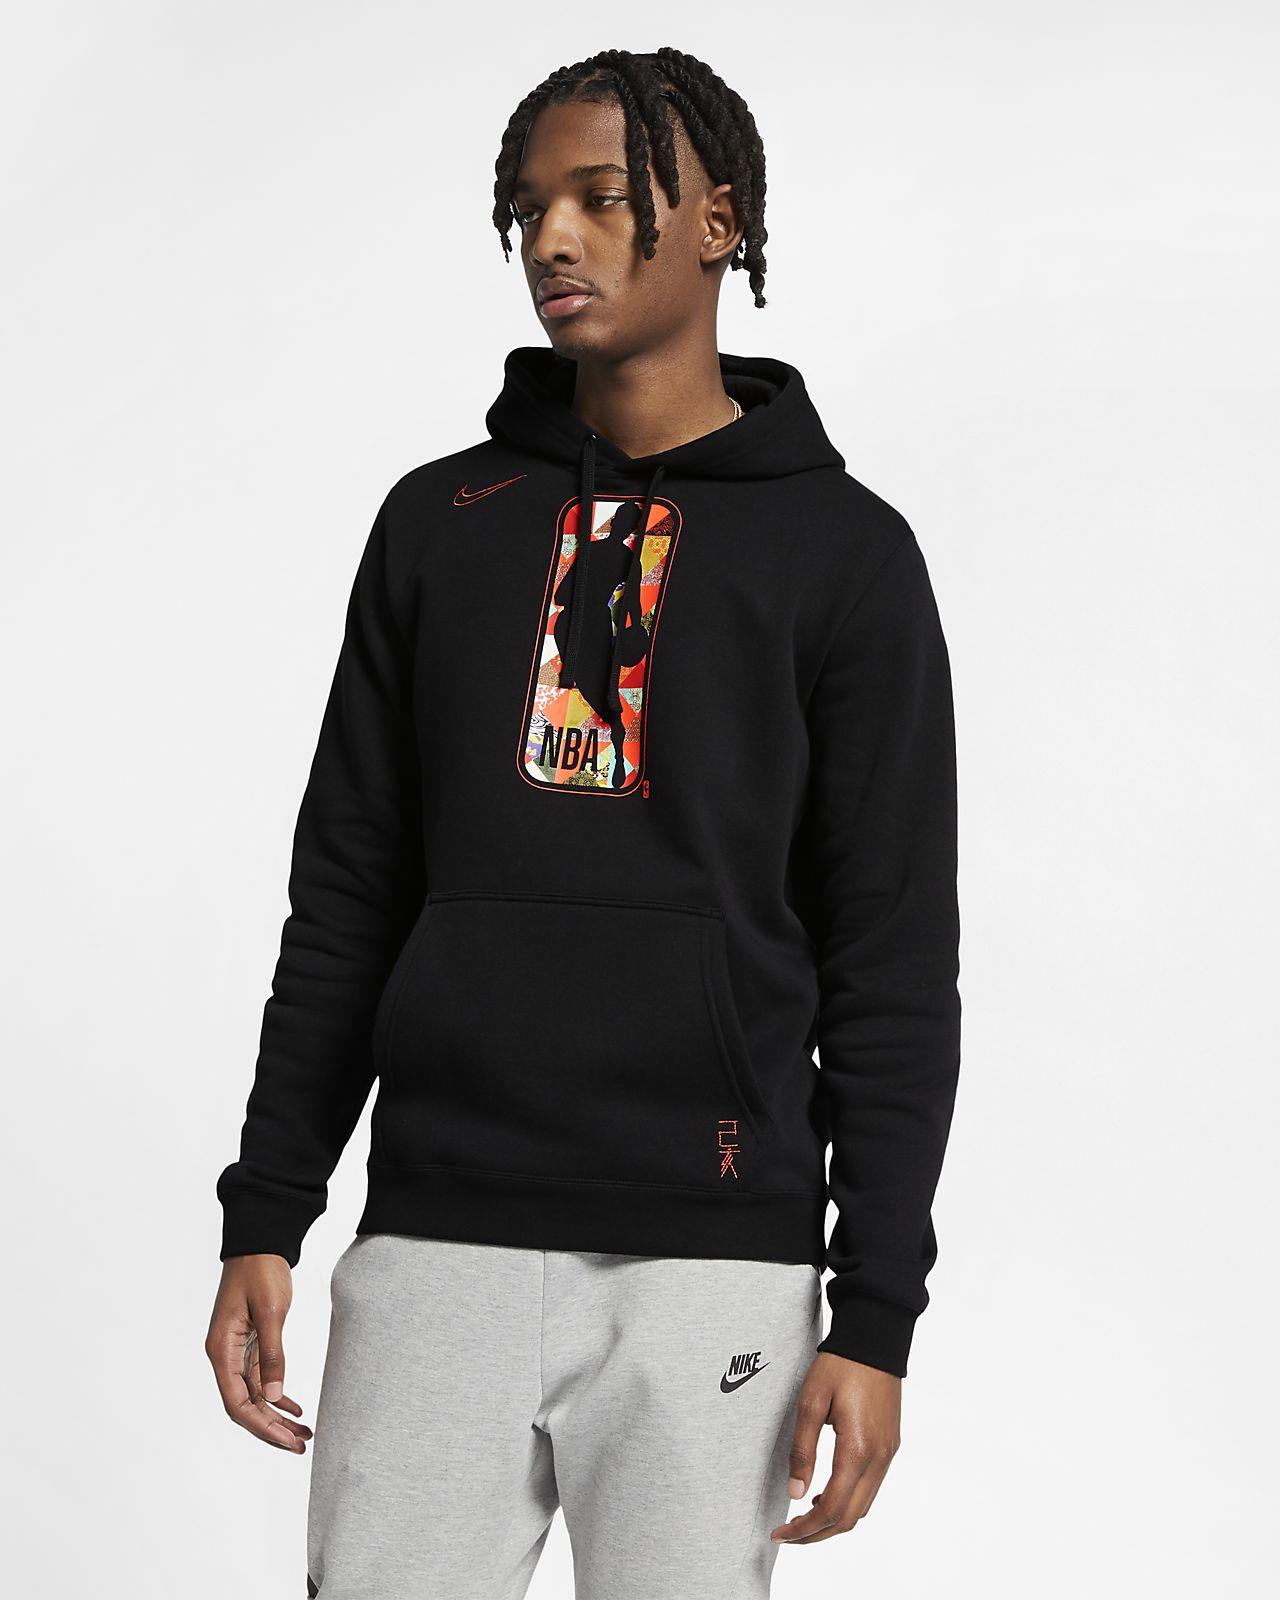 Hoodie NBA Nike CNY para homem